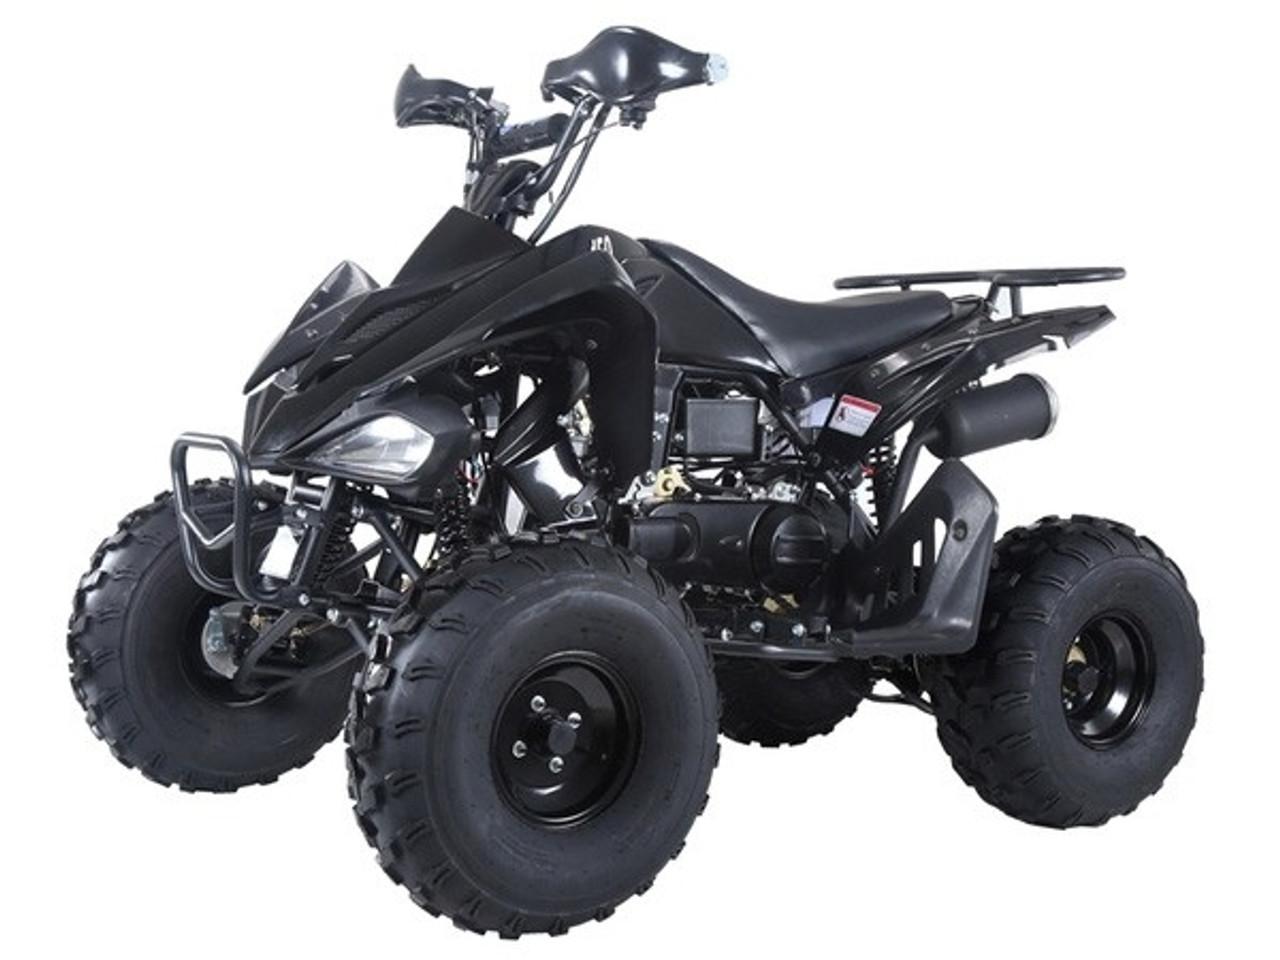 Taotao Motor 150G, 150CC